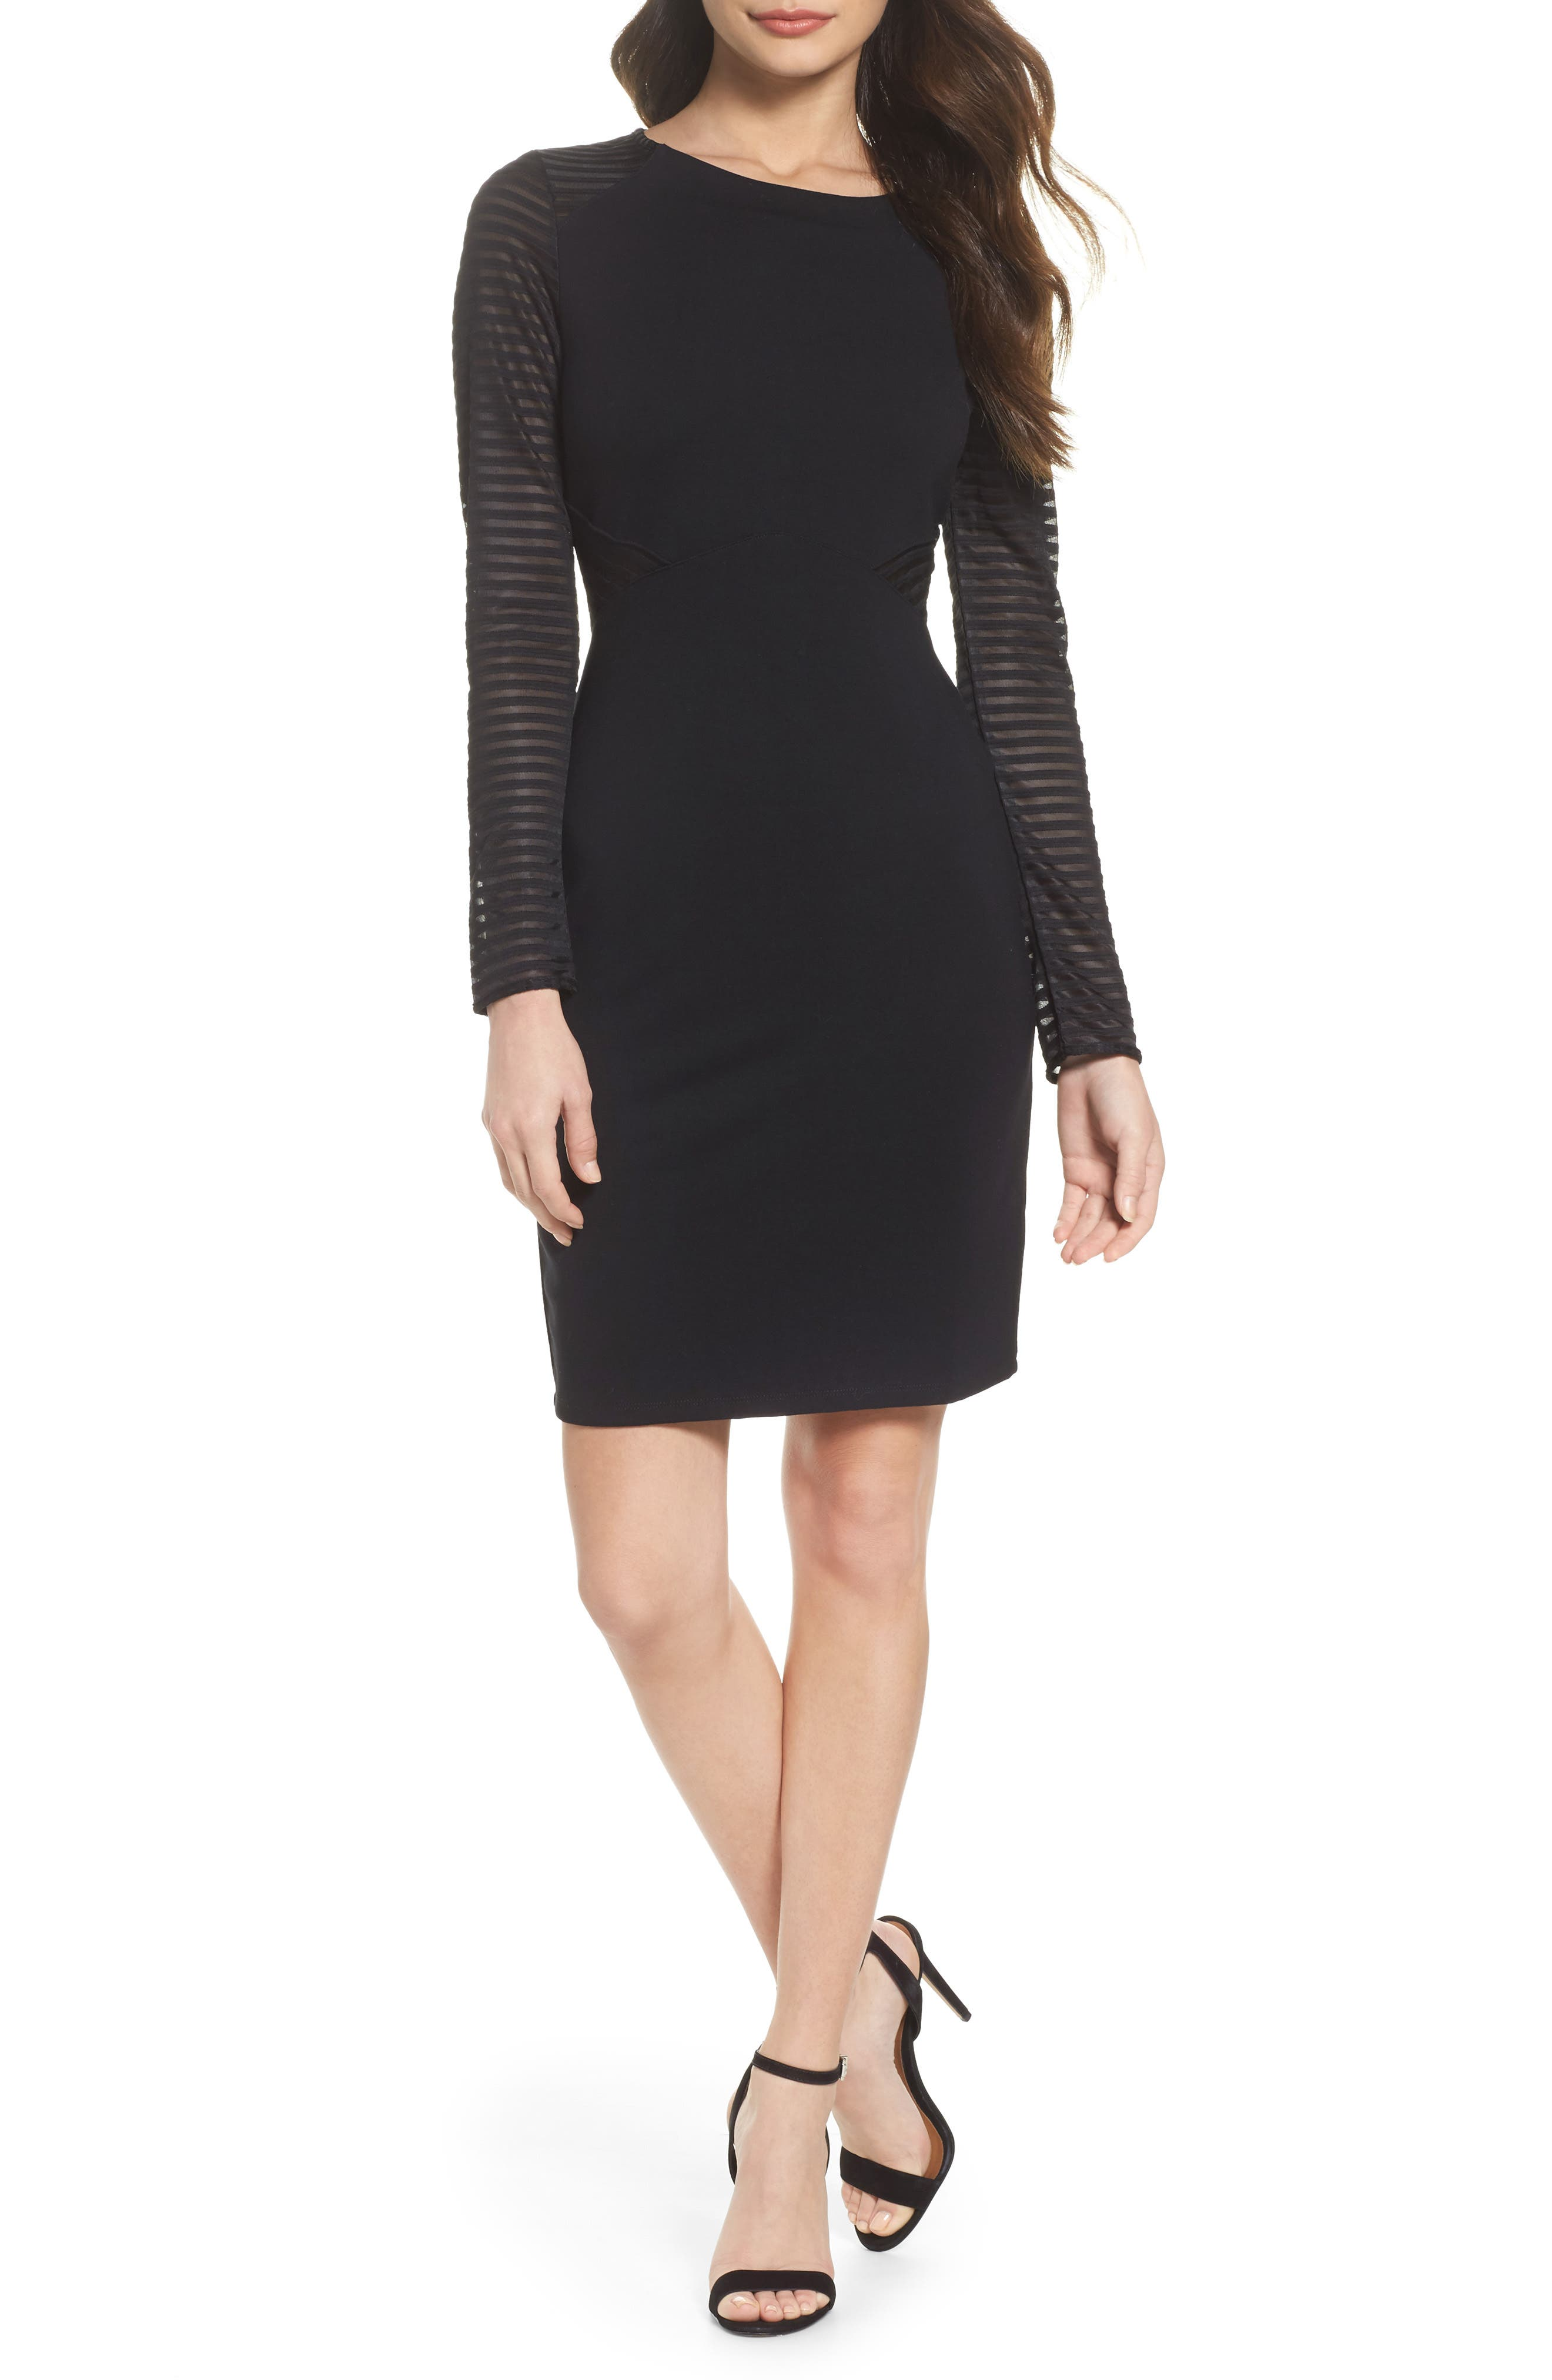 Thiestis Body-Con Dress,                         Main,                         color, 002